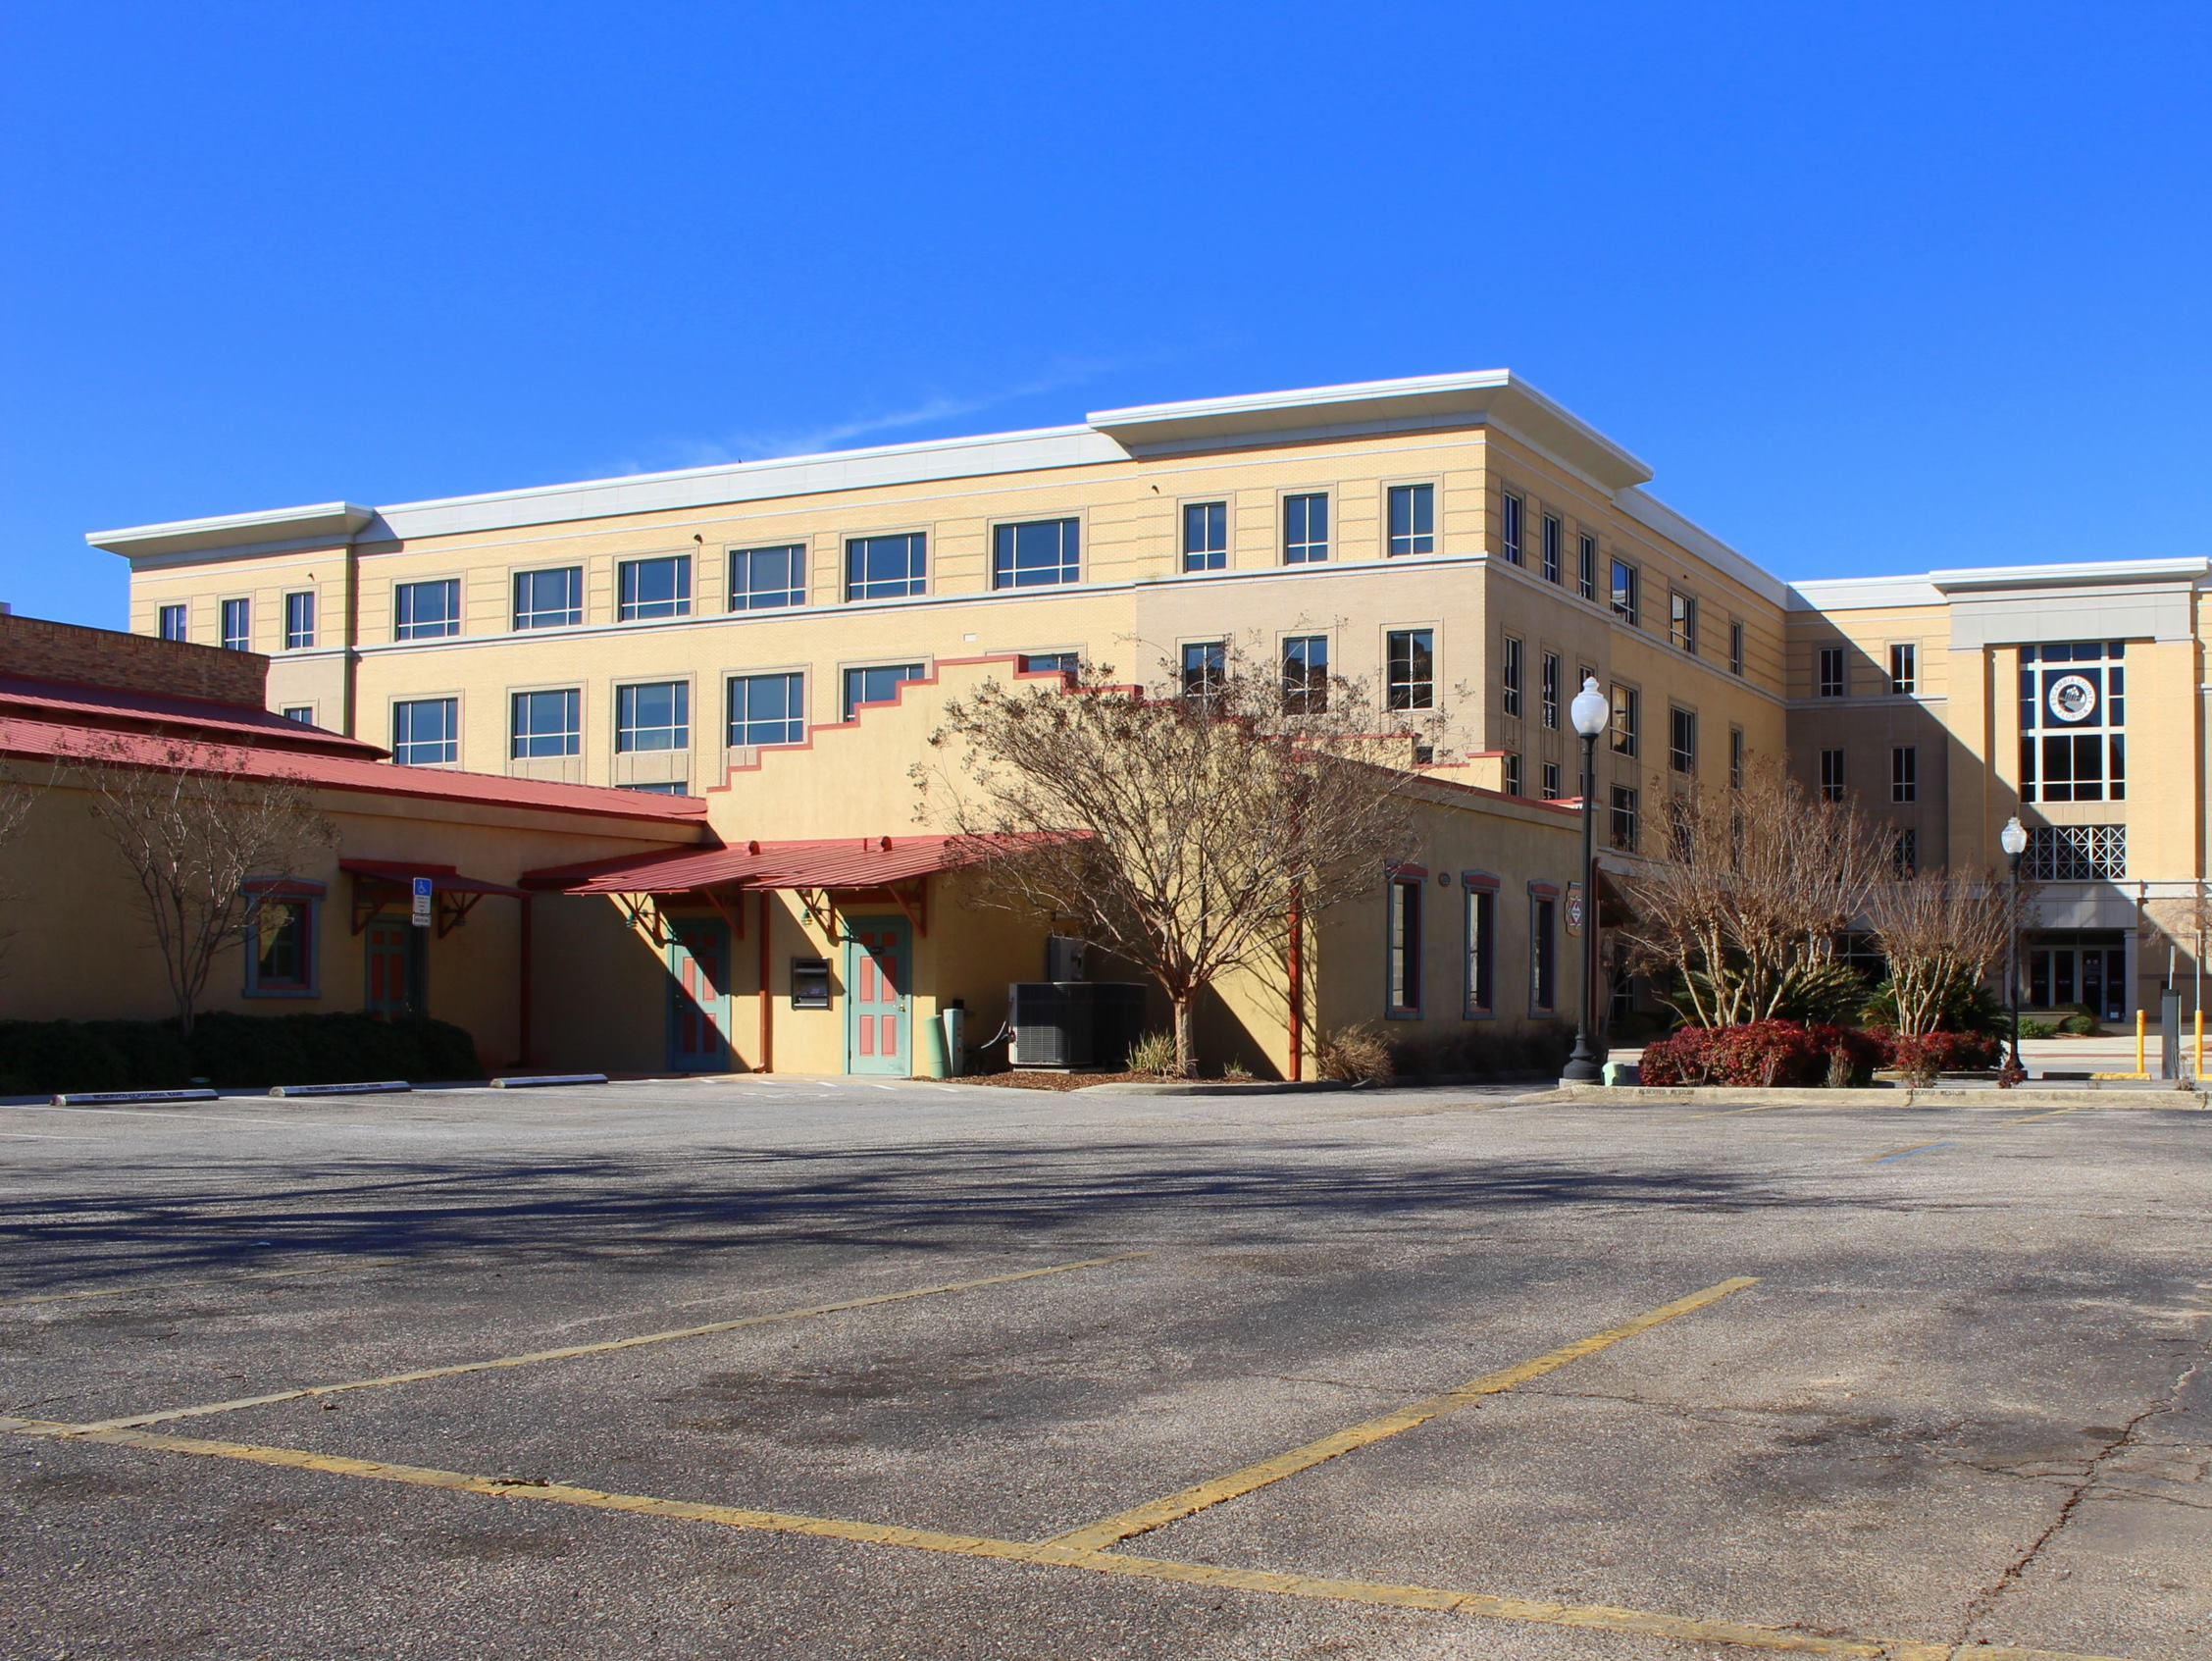 25 W. Government Street, Pensacola, FL